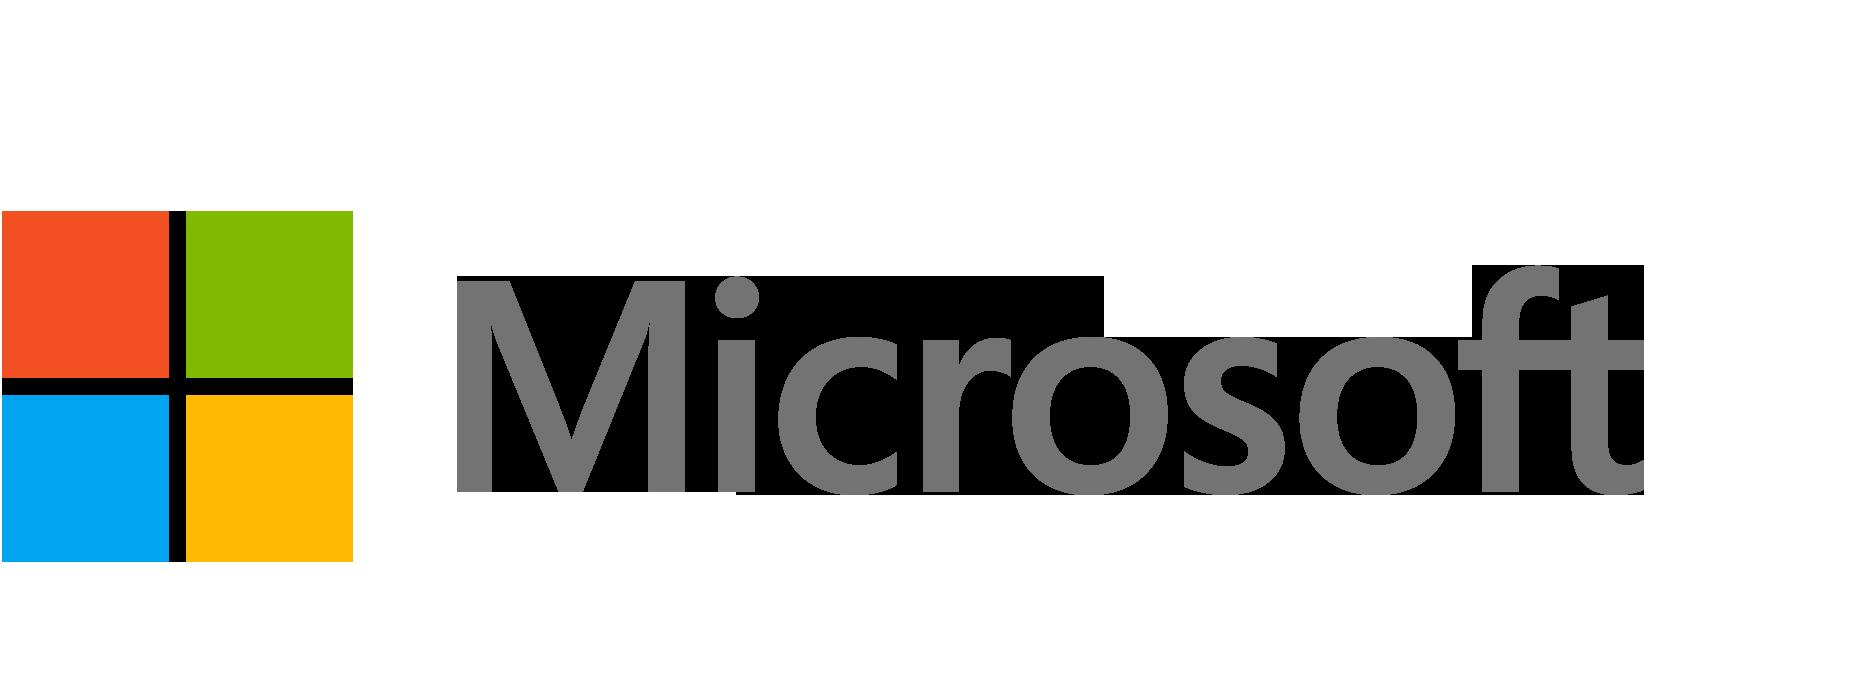 Windows Server Standard - 8 Core License Pack - 3 year (DG7GMGF0DVT9)